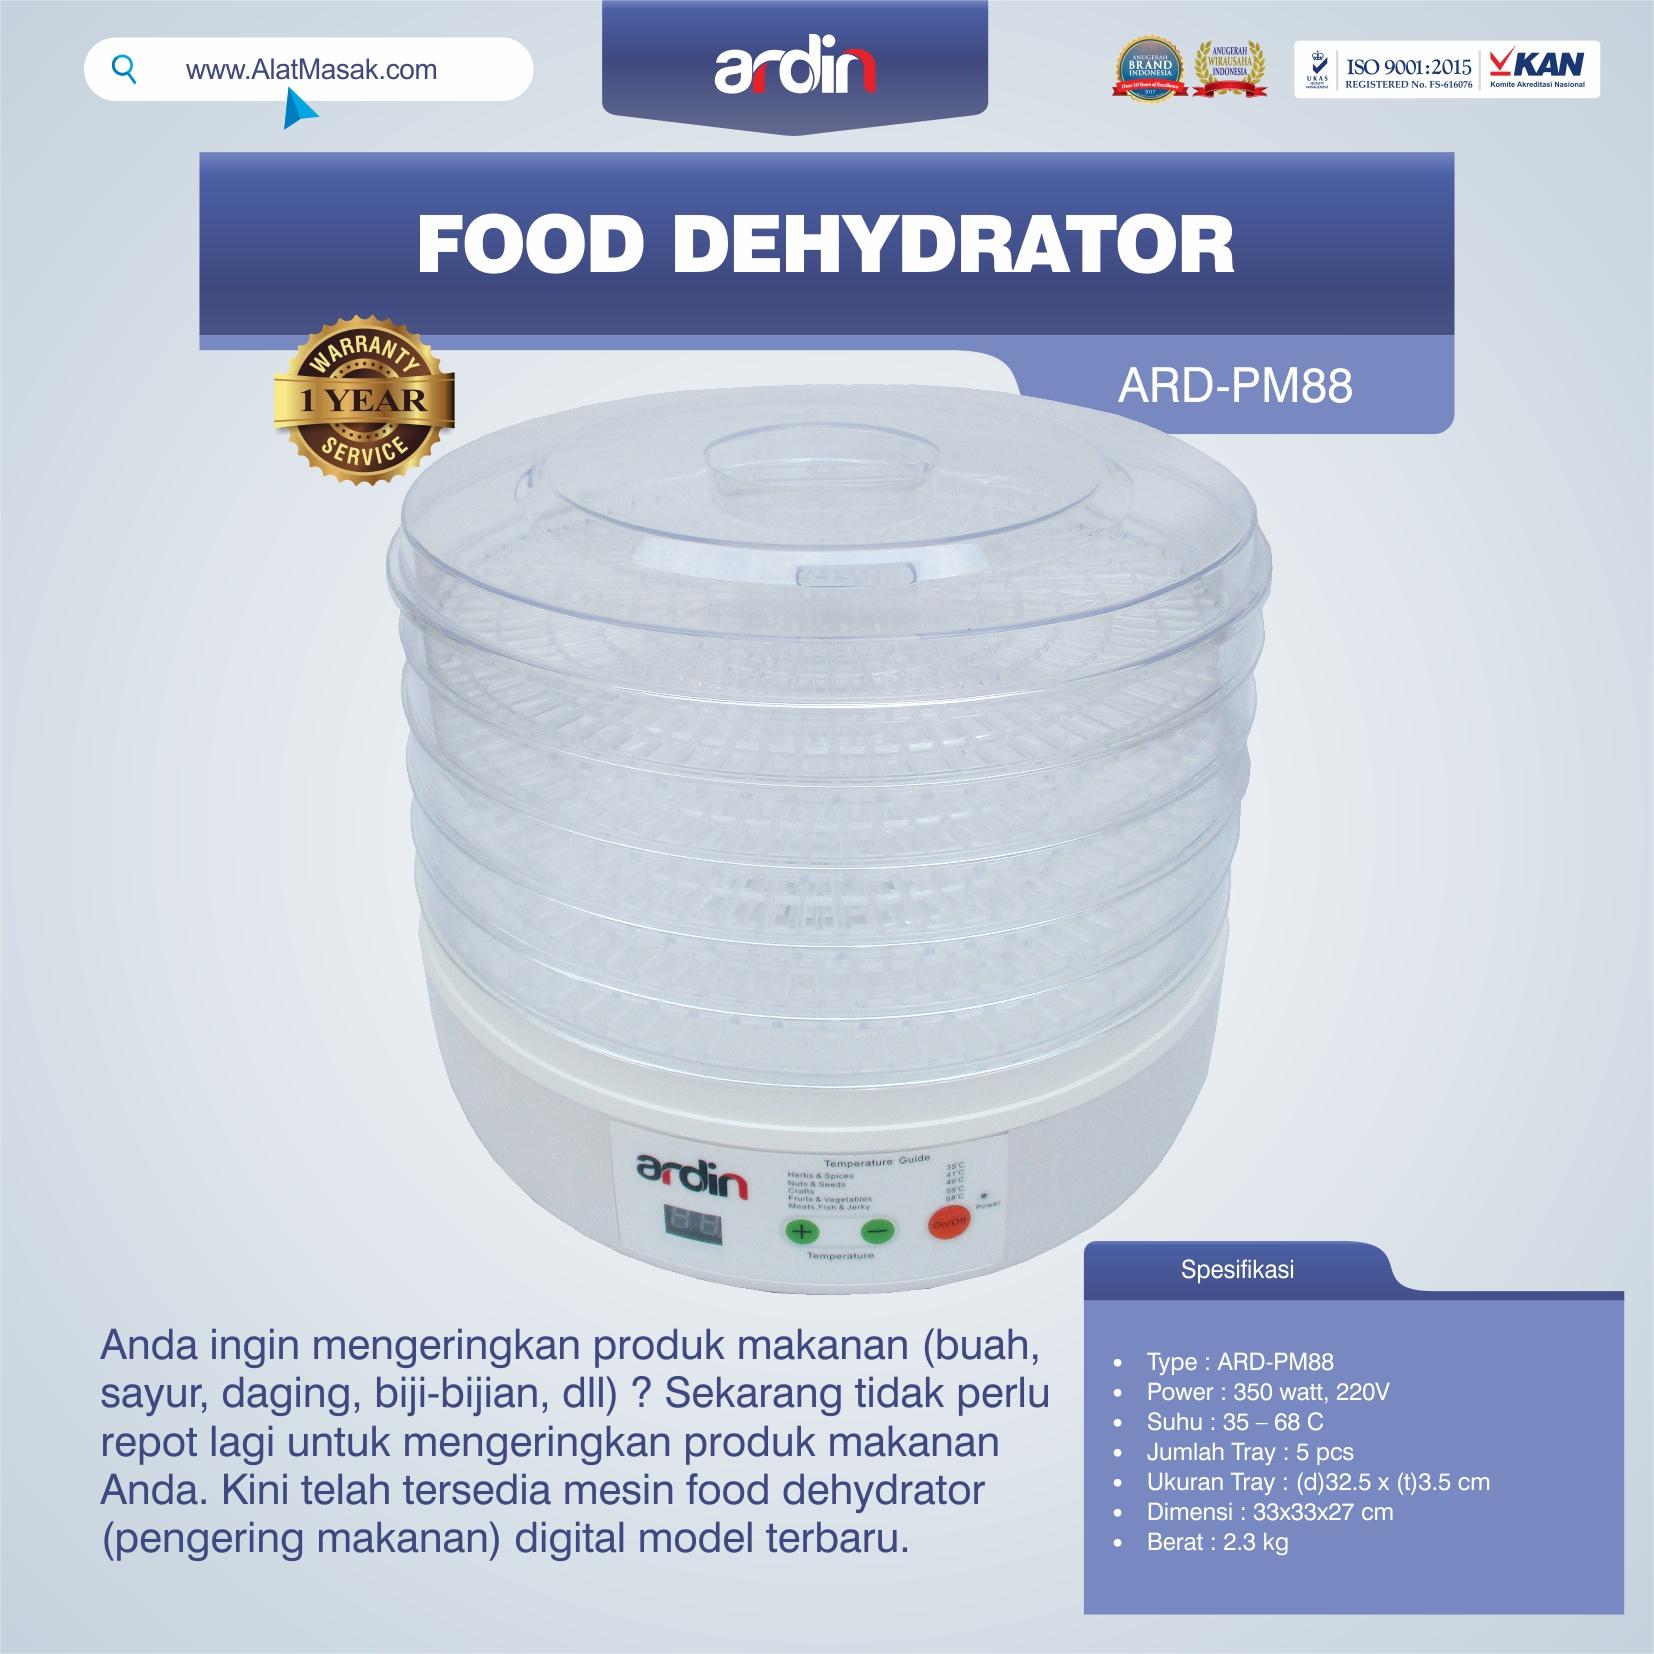 Jual Food Dehydrator ARD-PM88 Medan